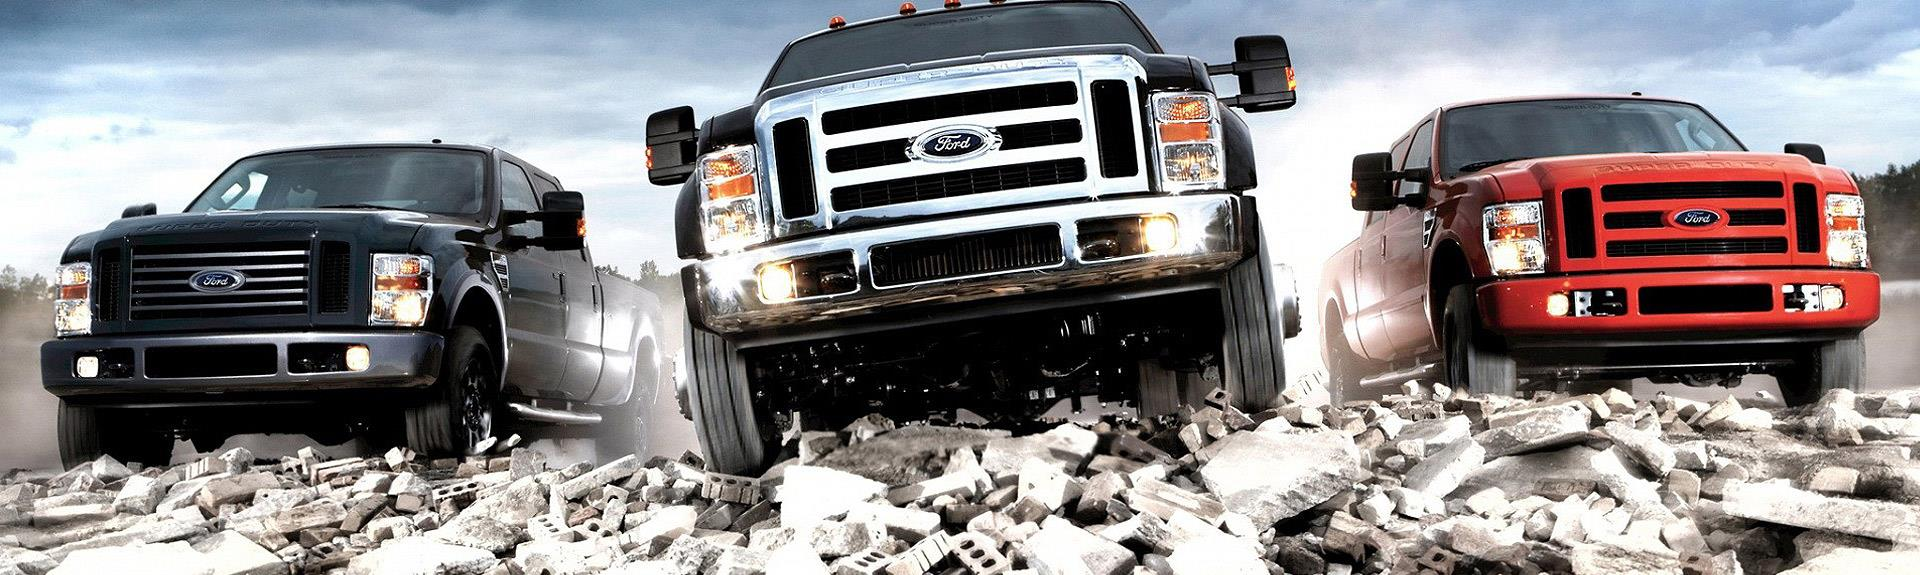 Truckland Spokane Wa New Used Cars Trucks Sales Service